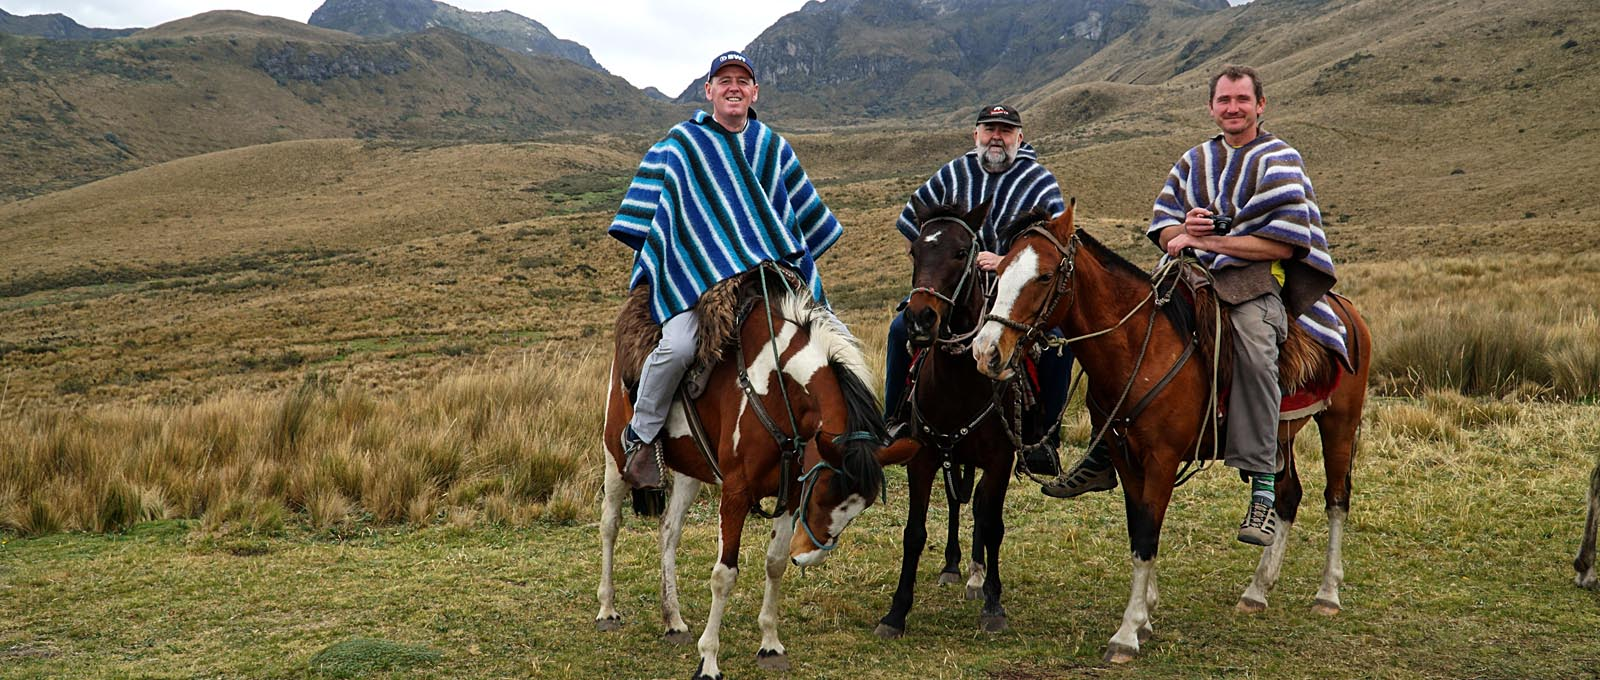 To Ried oppem Husboajch von Quito. Em Hinjagrunt dee Vulkan Oola Pchincha (4690 m). © Andreas Harms